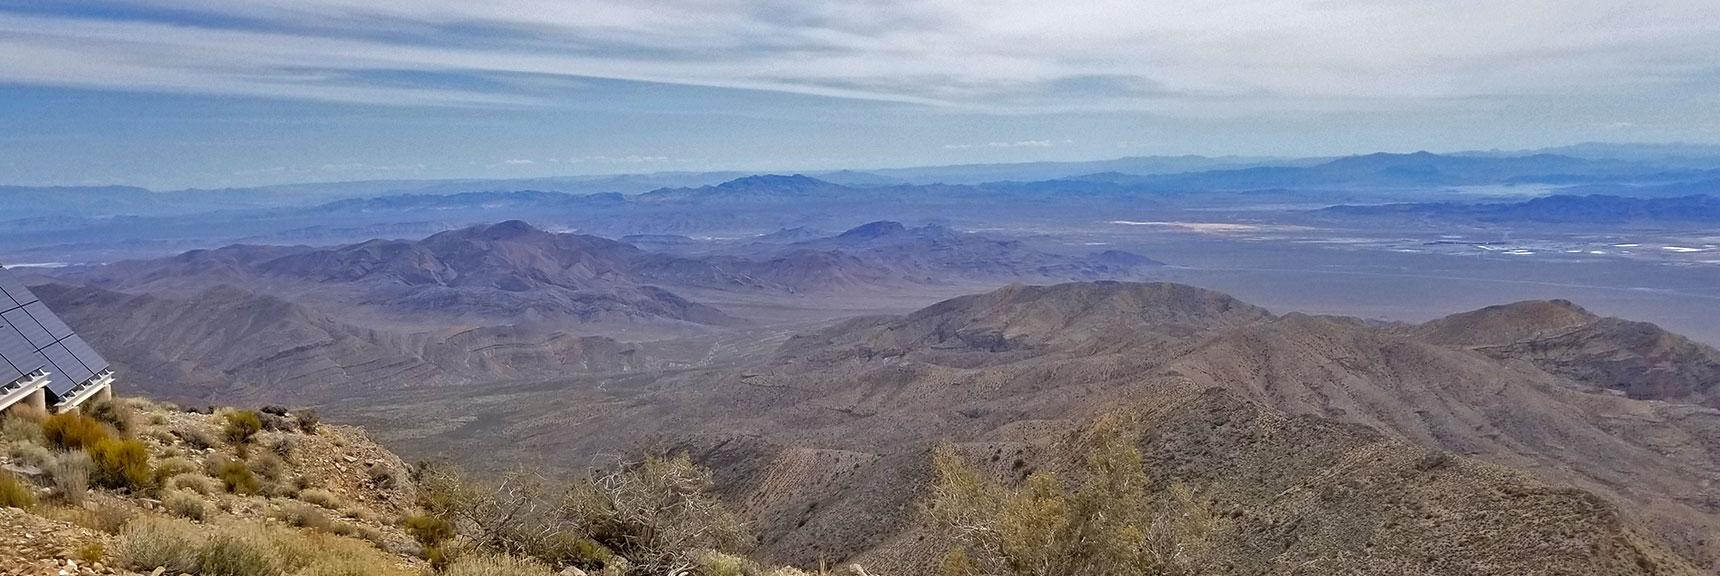 View East of Las Vegas from Gass Peak Eastern Summit | Gass Peak Eastern Summit Ultra-marathon Adventure, Nevada